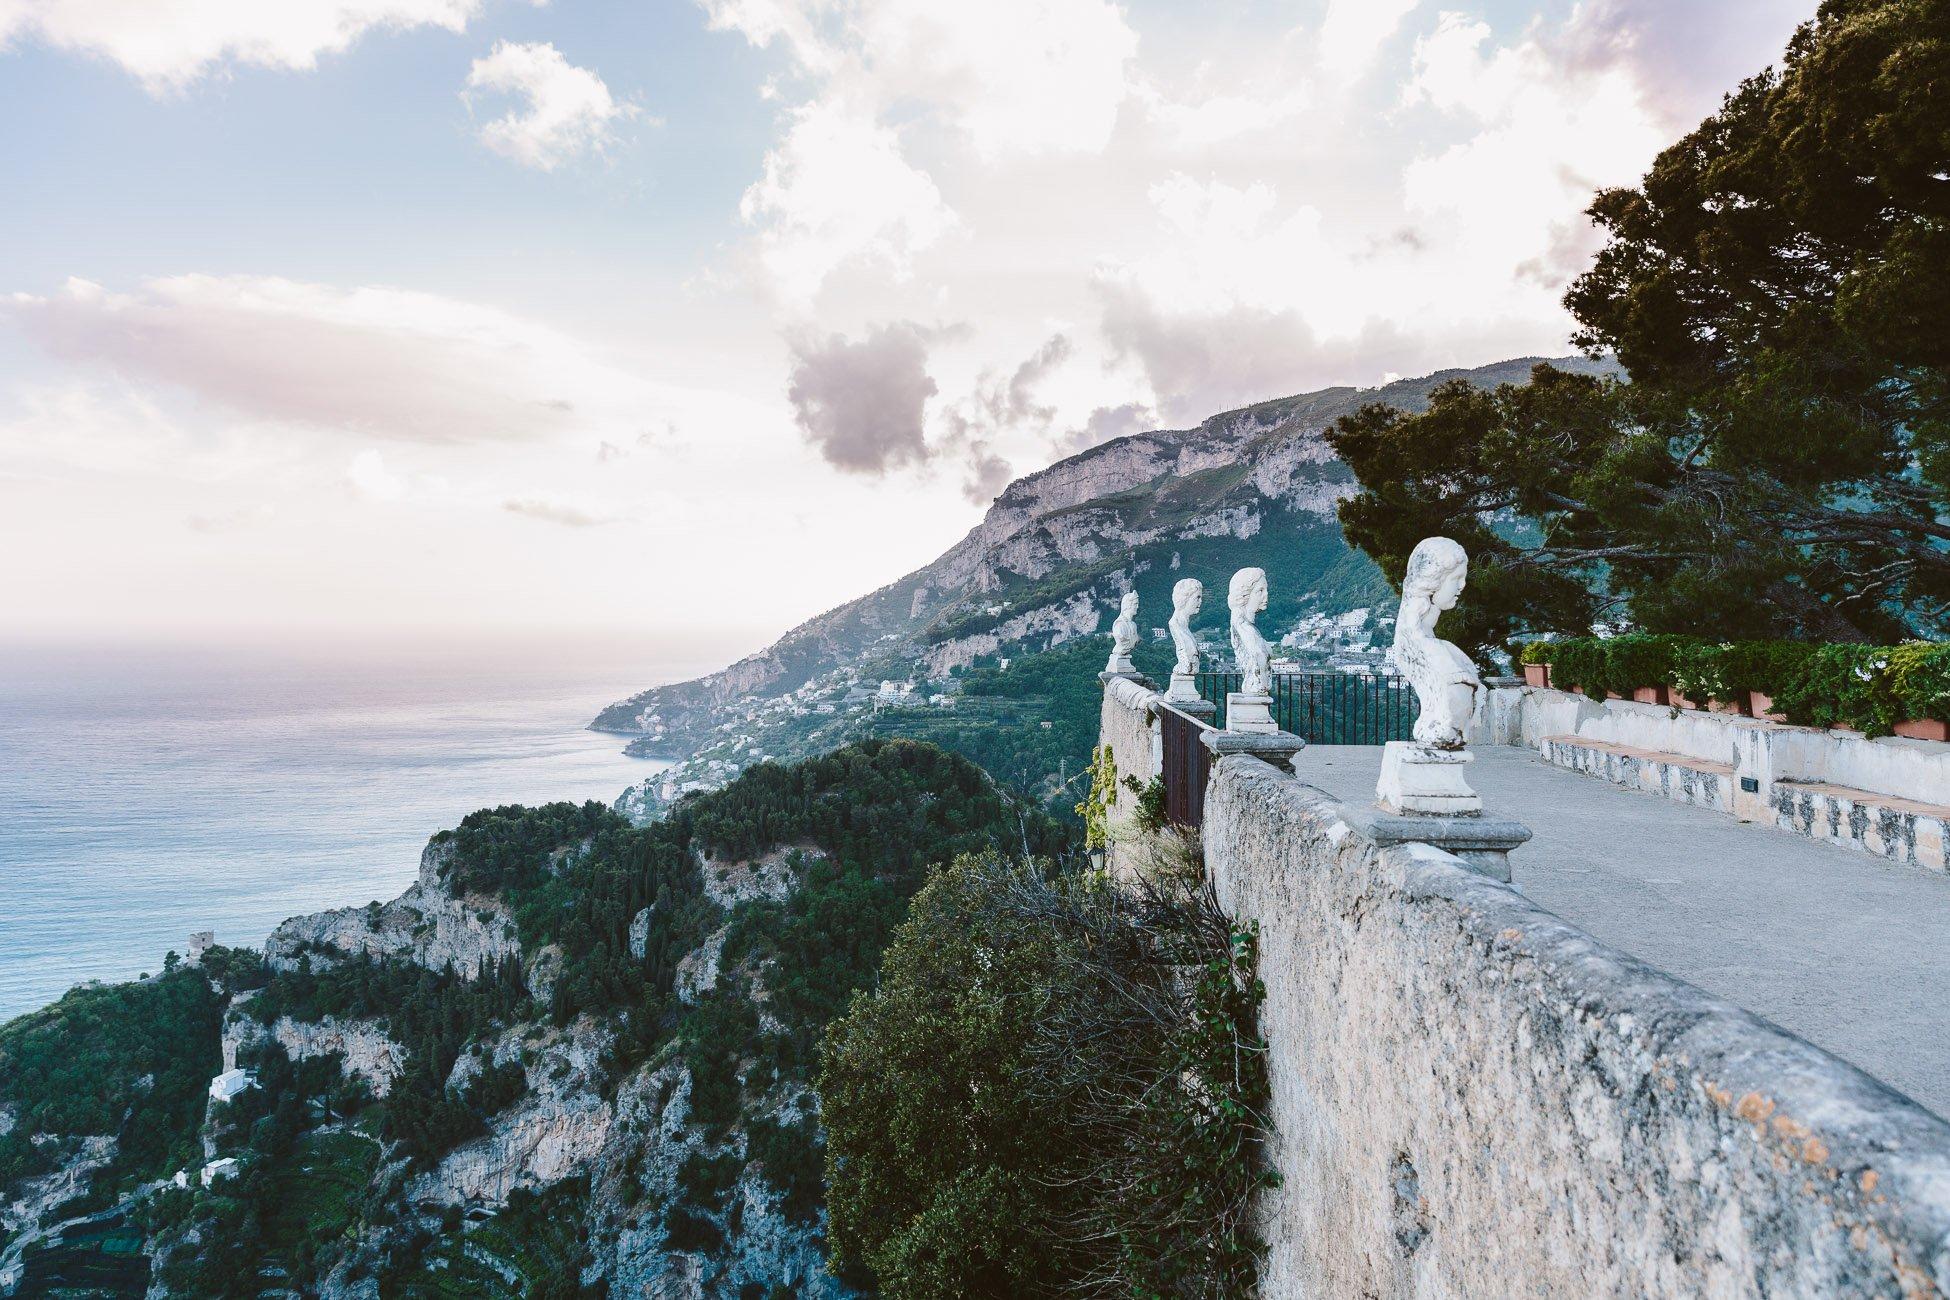 The famous balcony of Villa Cimbrone in Ravello